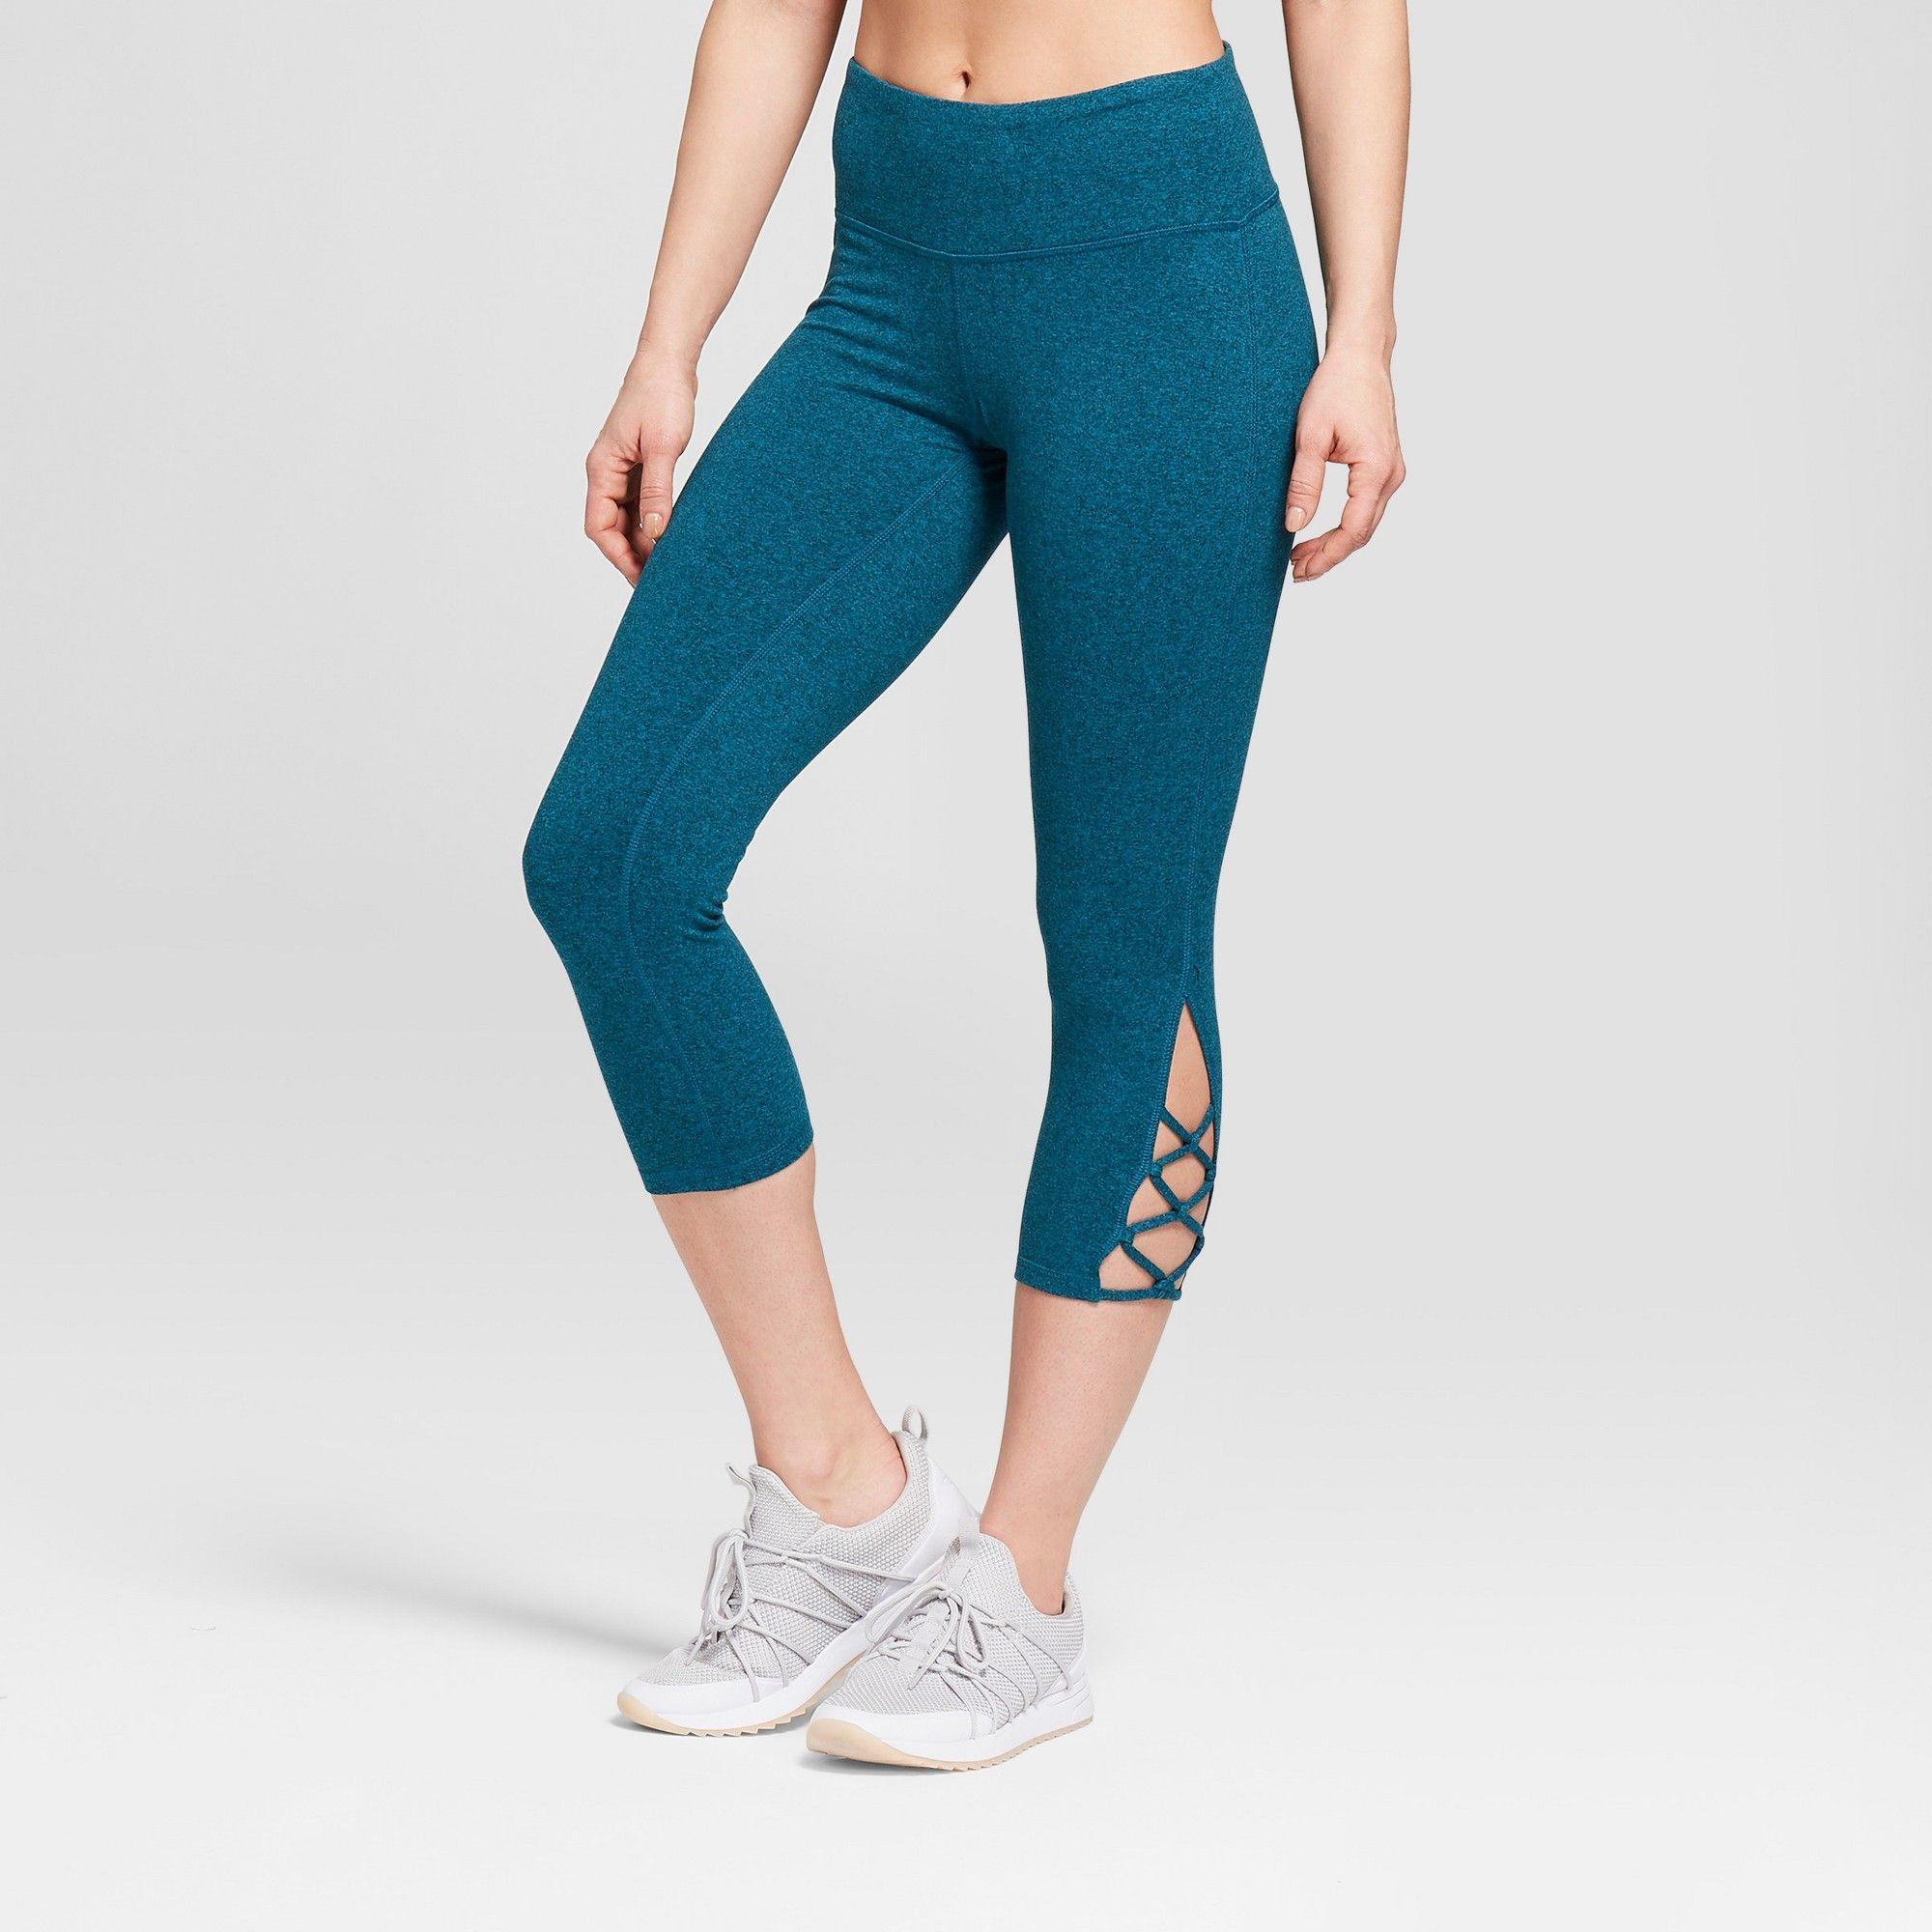 933c4a6f92c638 Women's Freedom High-Waisted Lattice Capri Leggings - C9 Champion Mermaid  Green Xxl